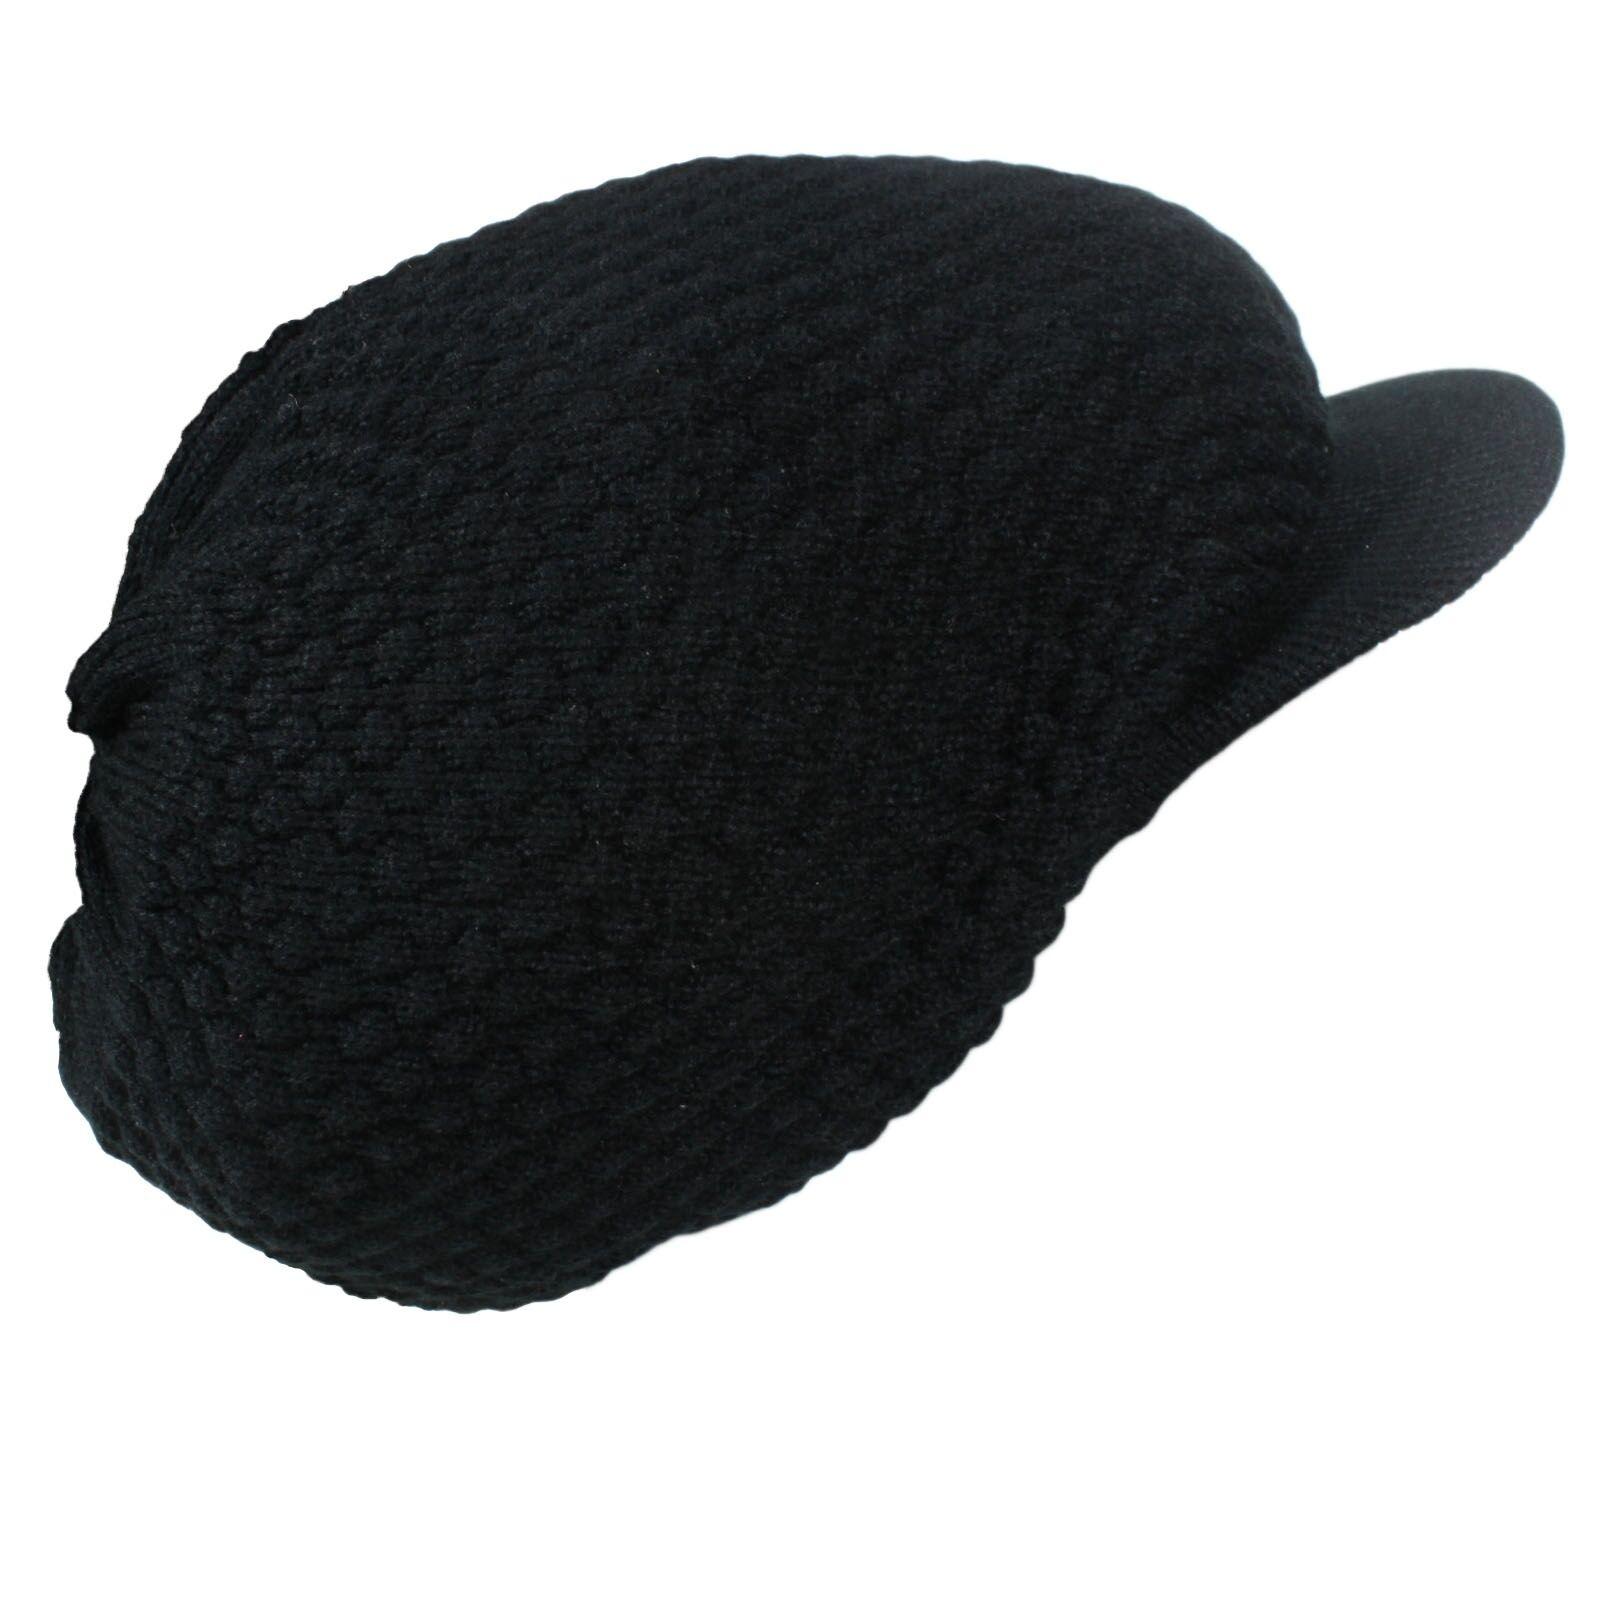 8e8db5f4a4d Rasta Natty Dread Dreadlocks Cap Hat Hippie Irie Reggae Marley Jamaica XL  to XXL for sale online